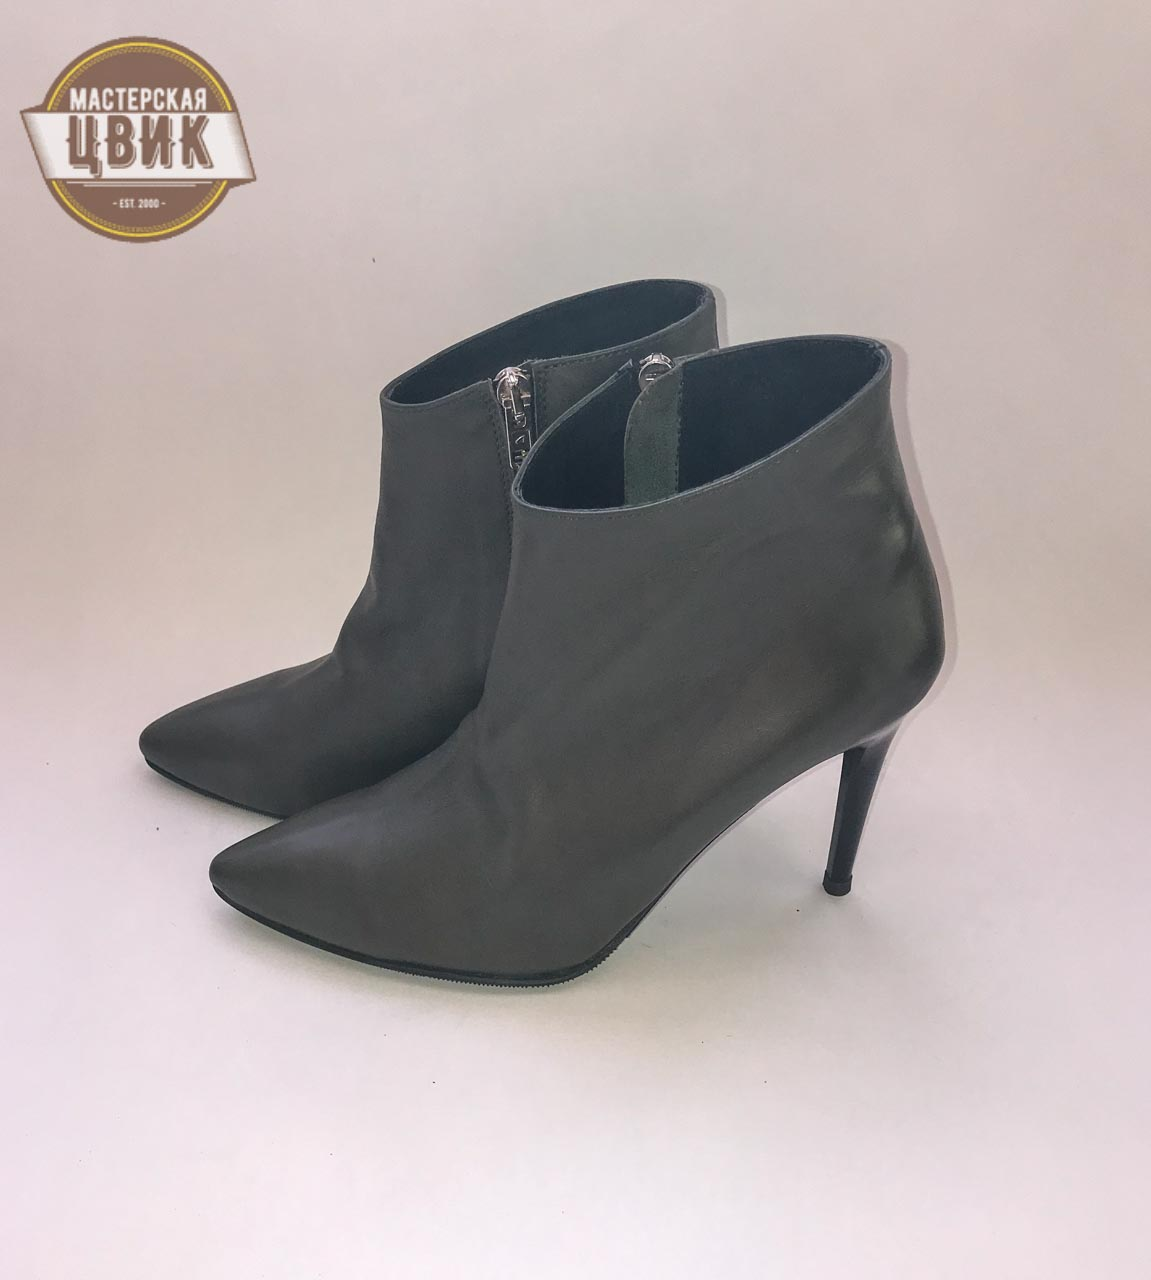 individualnyj-poshiv-obuvi-minsk-41 Индивидуальный пошив обуви